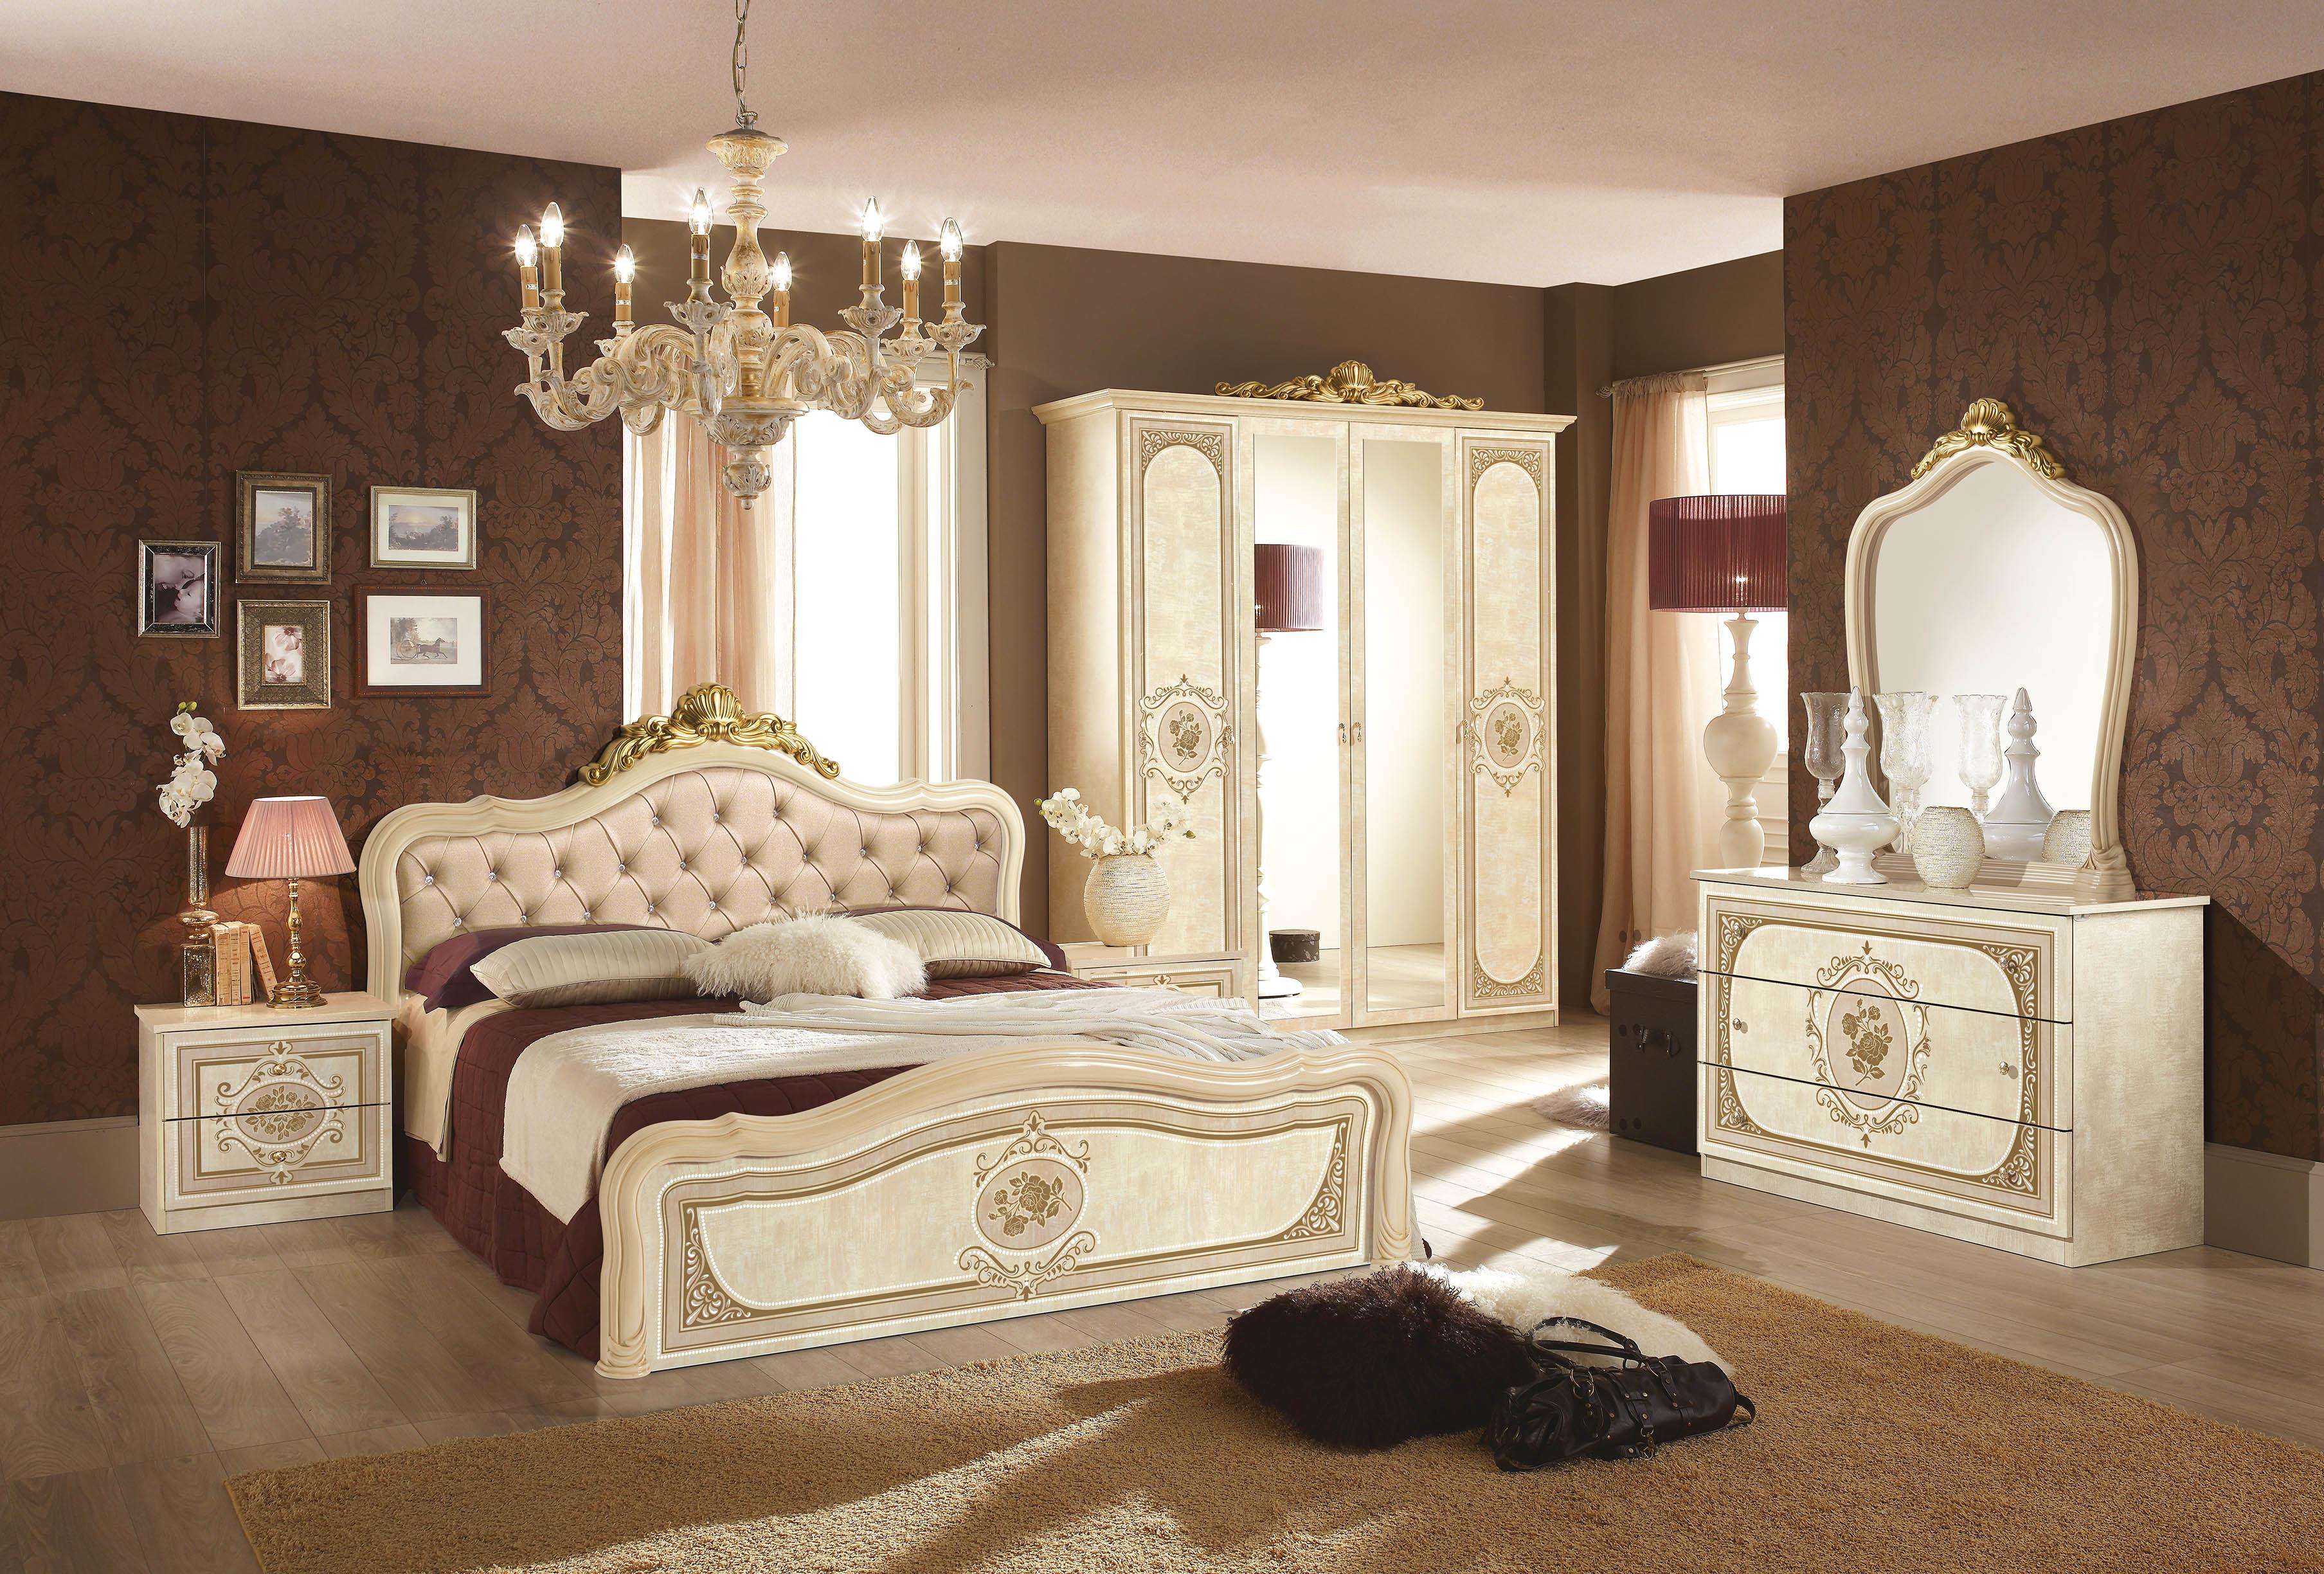 Schlafzimmer Alice in schwarz Gold Barock 160x200cm 4tlg-XP_PFALCCA6